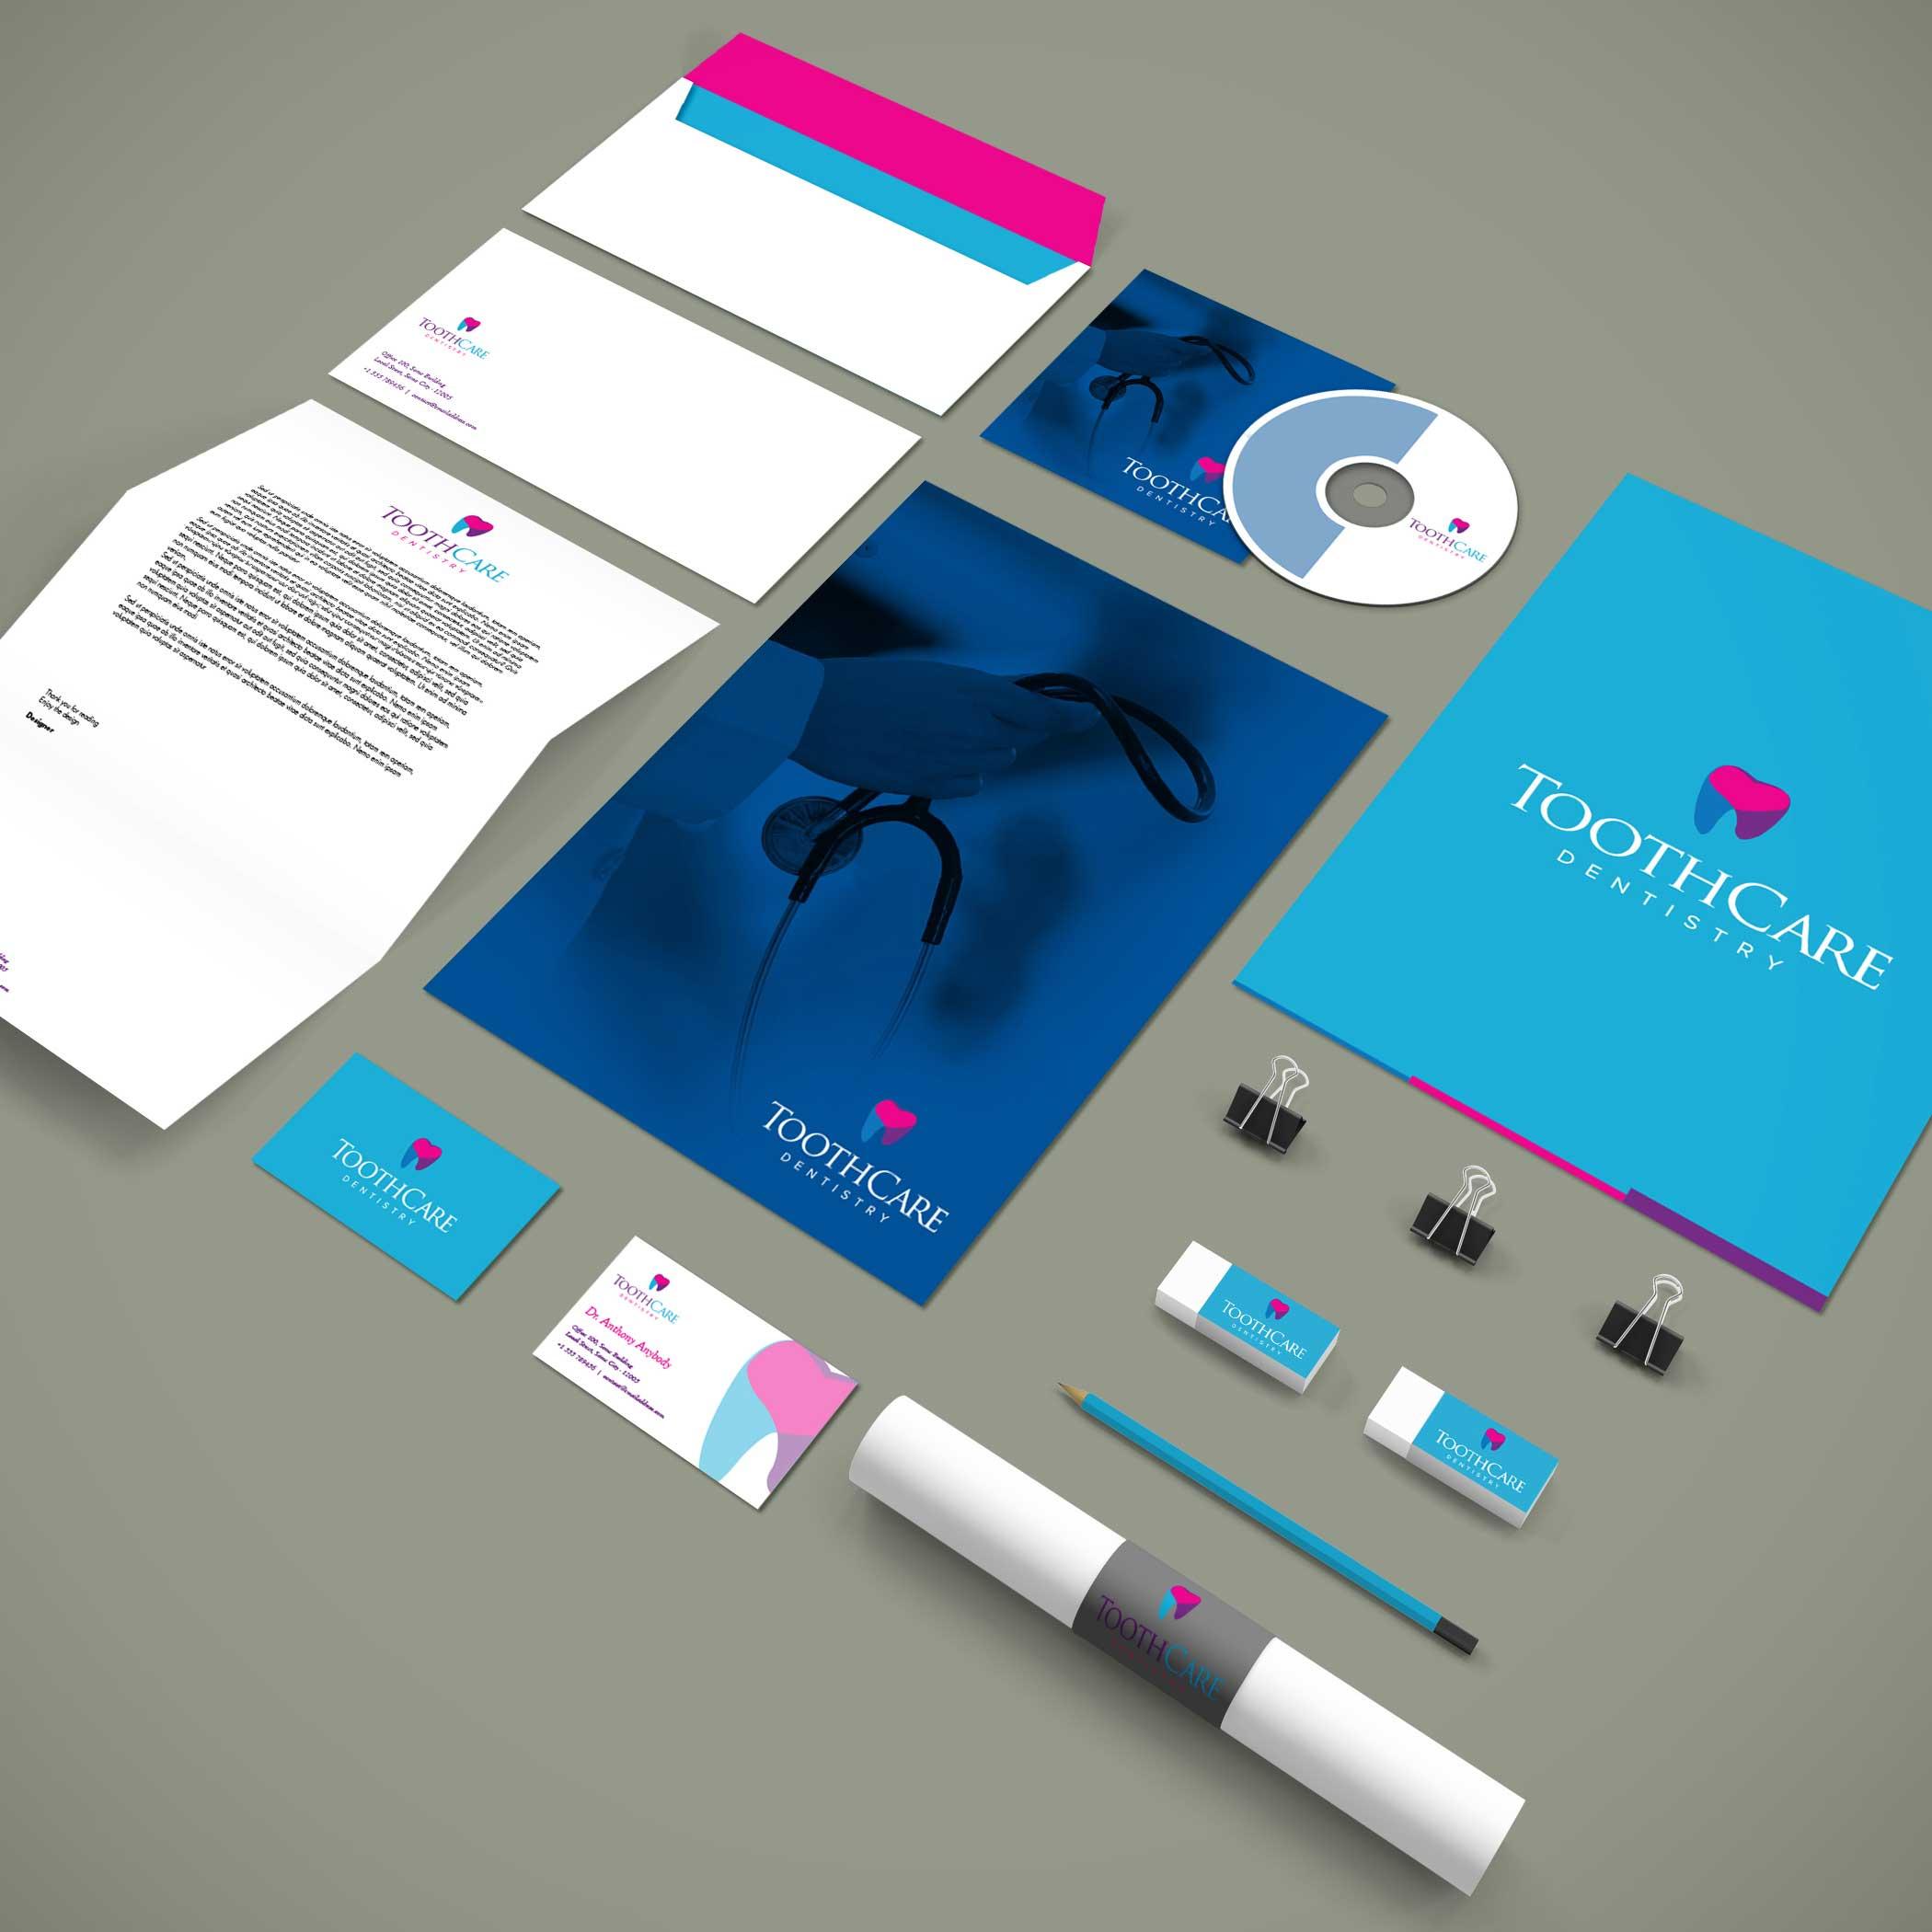 logo design service for Tooth Care